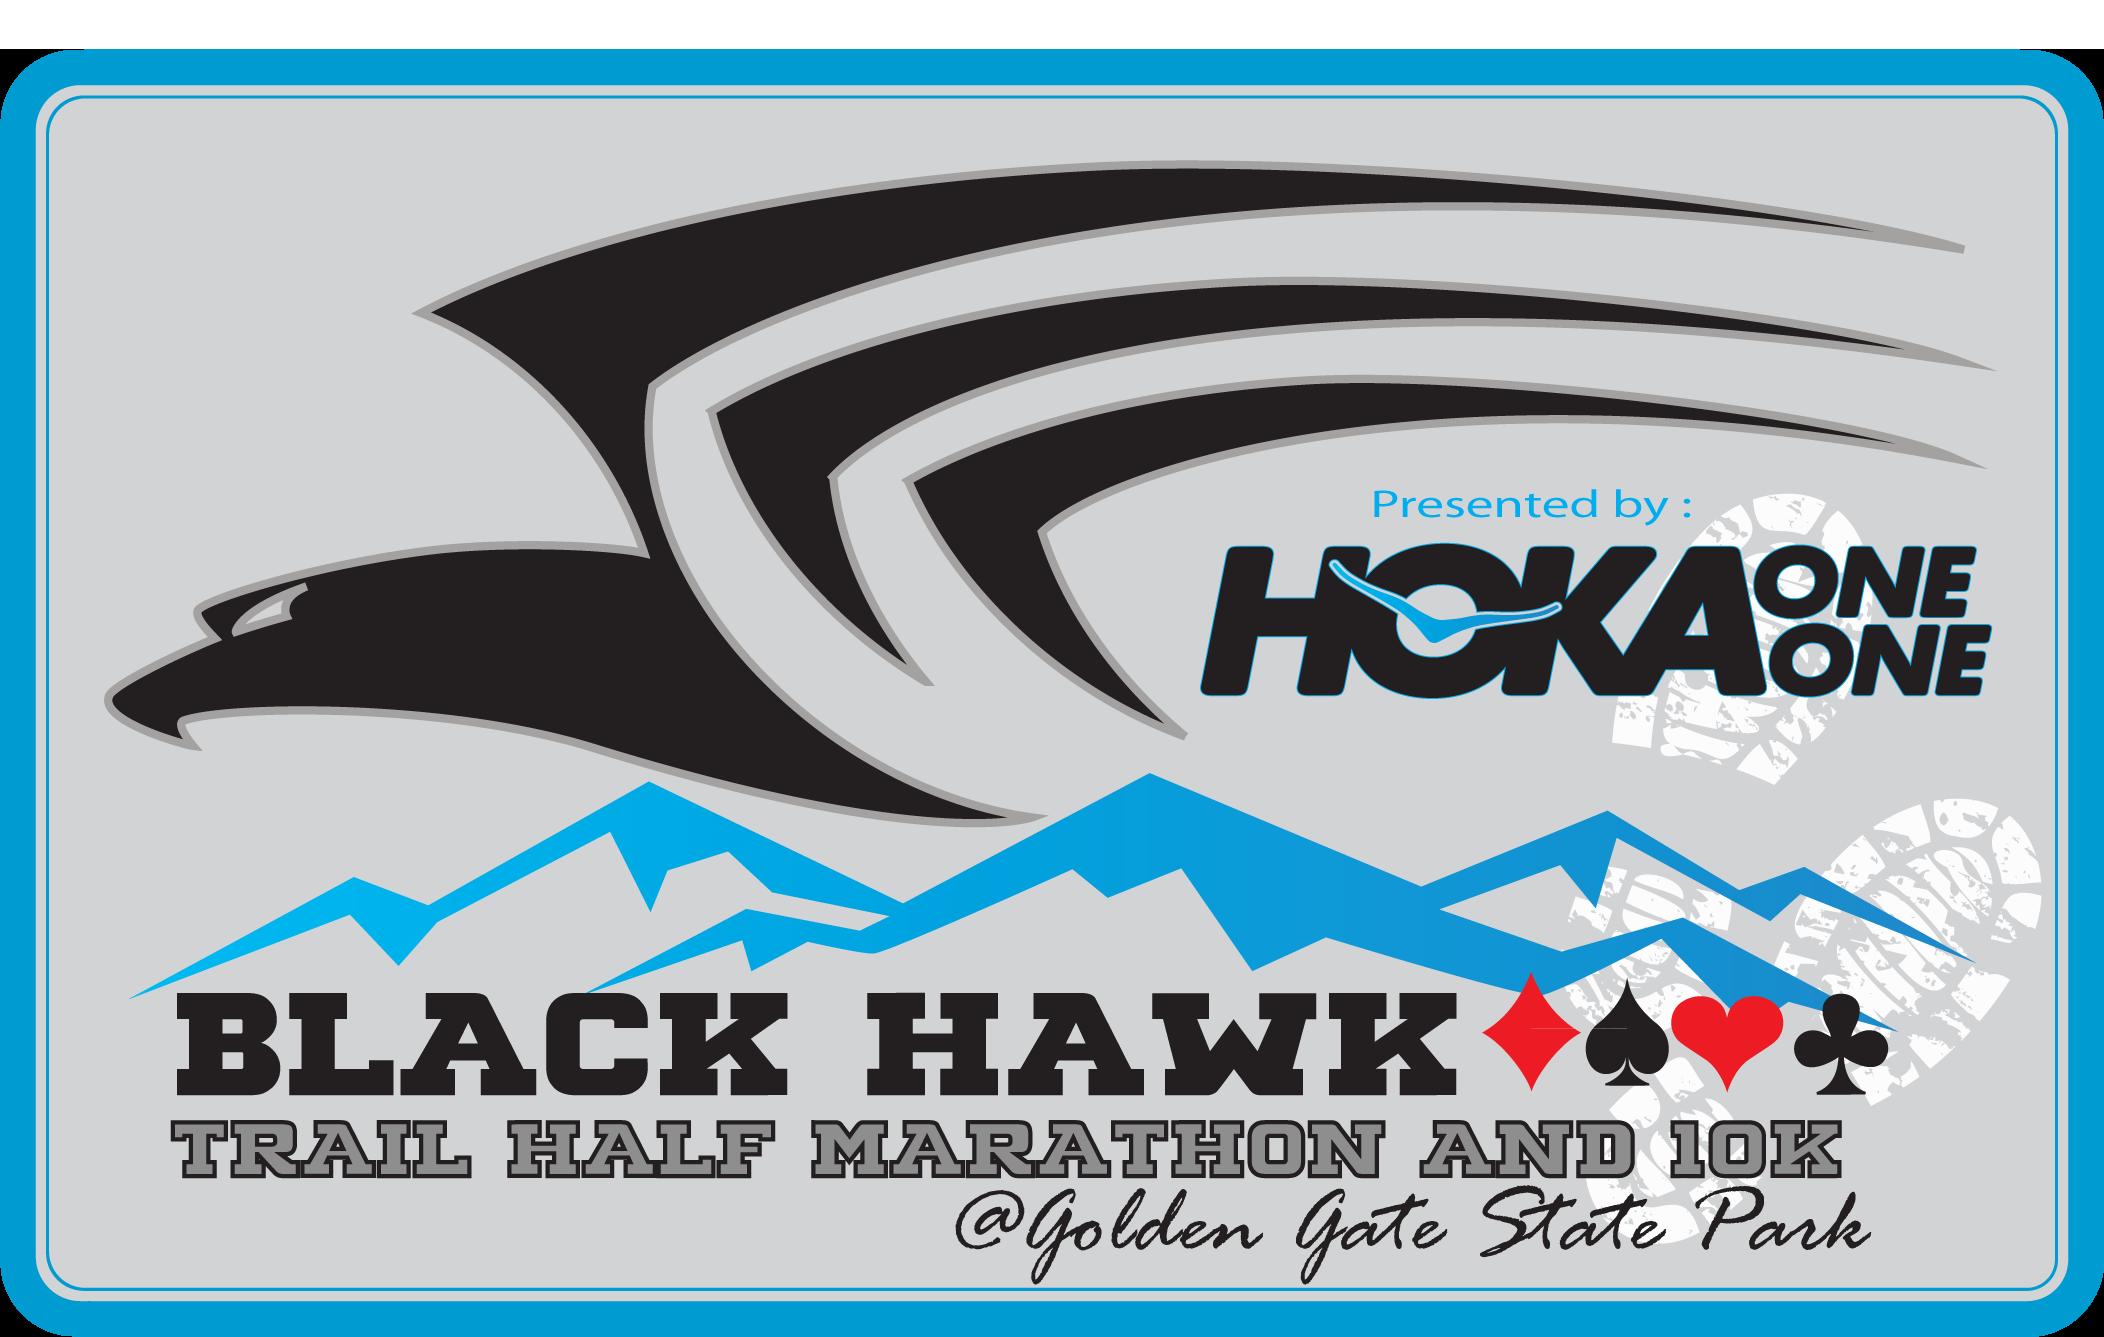 Endurance Race Series - BLACK HAWK TRAIL 1/2 MARATHON, 10K.  July 31,2016.